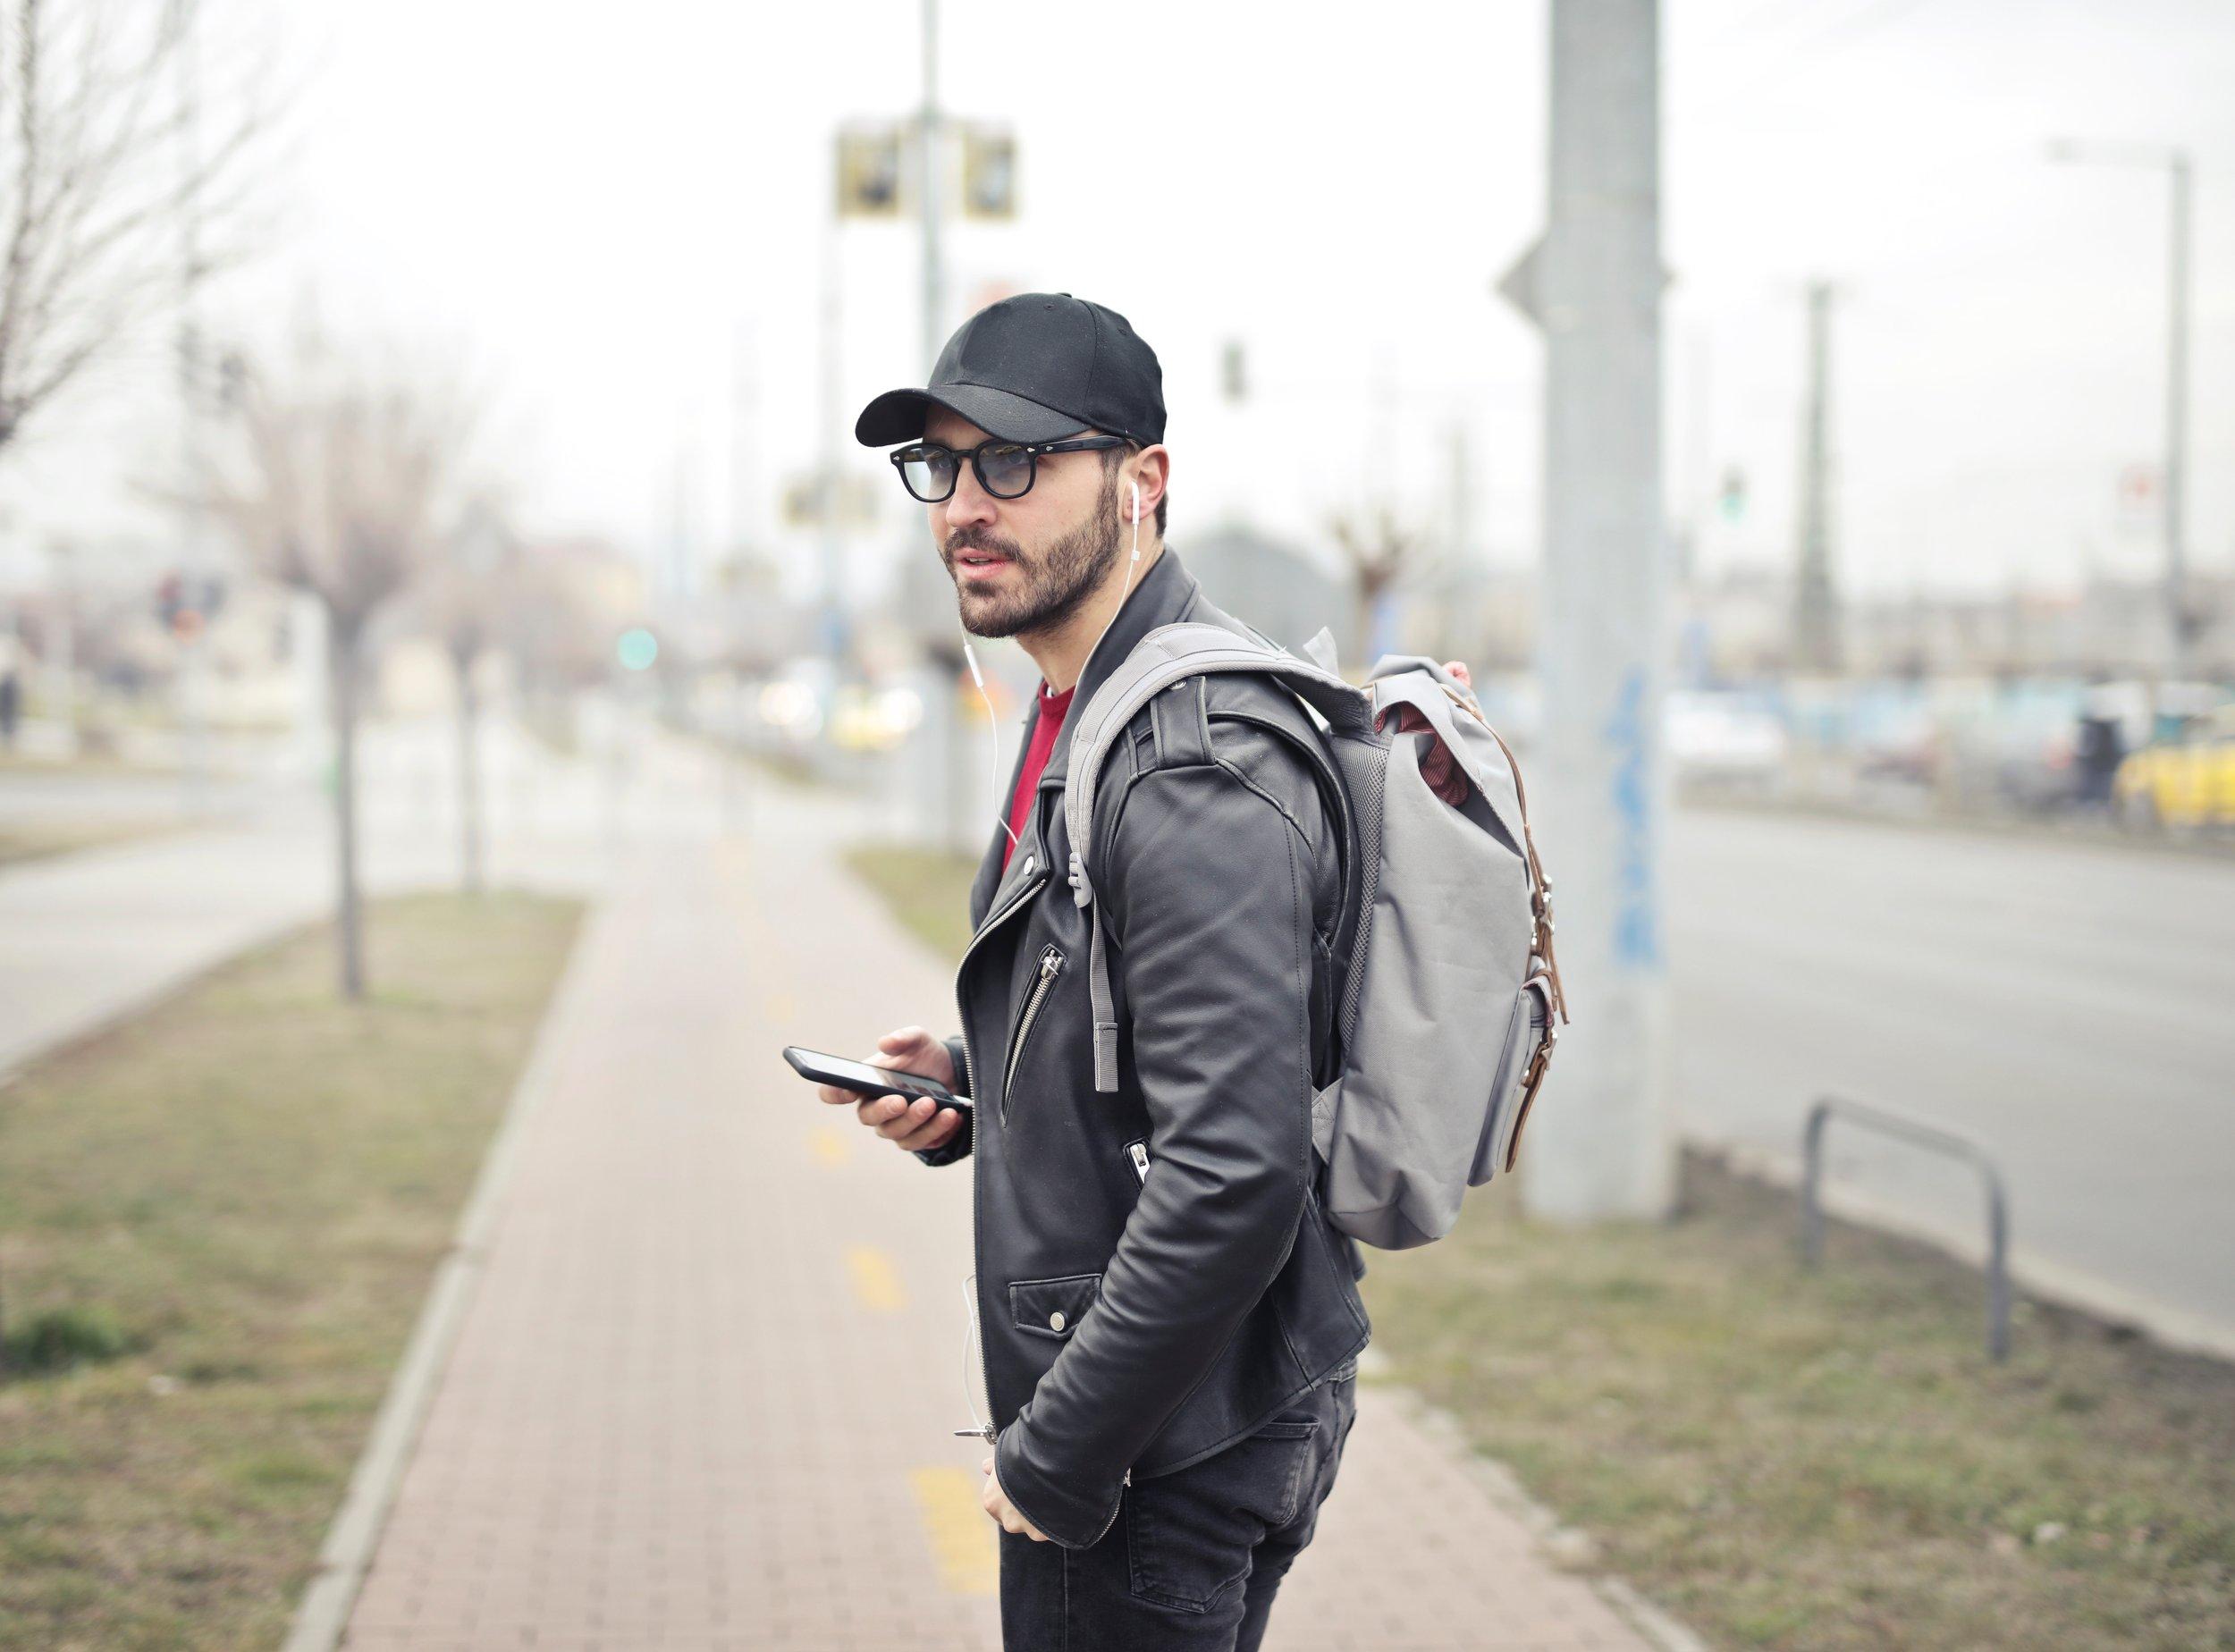 adult-backpack-city-845457.jpg